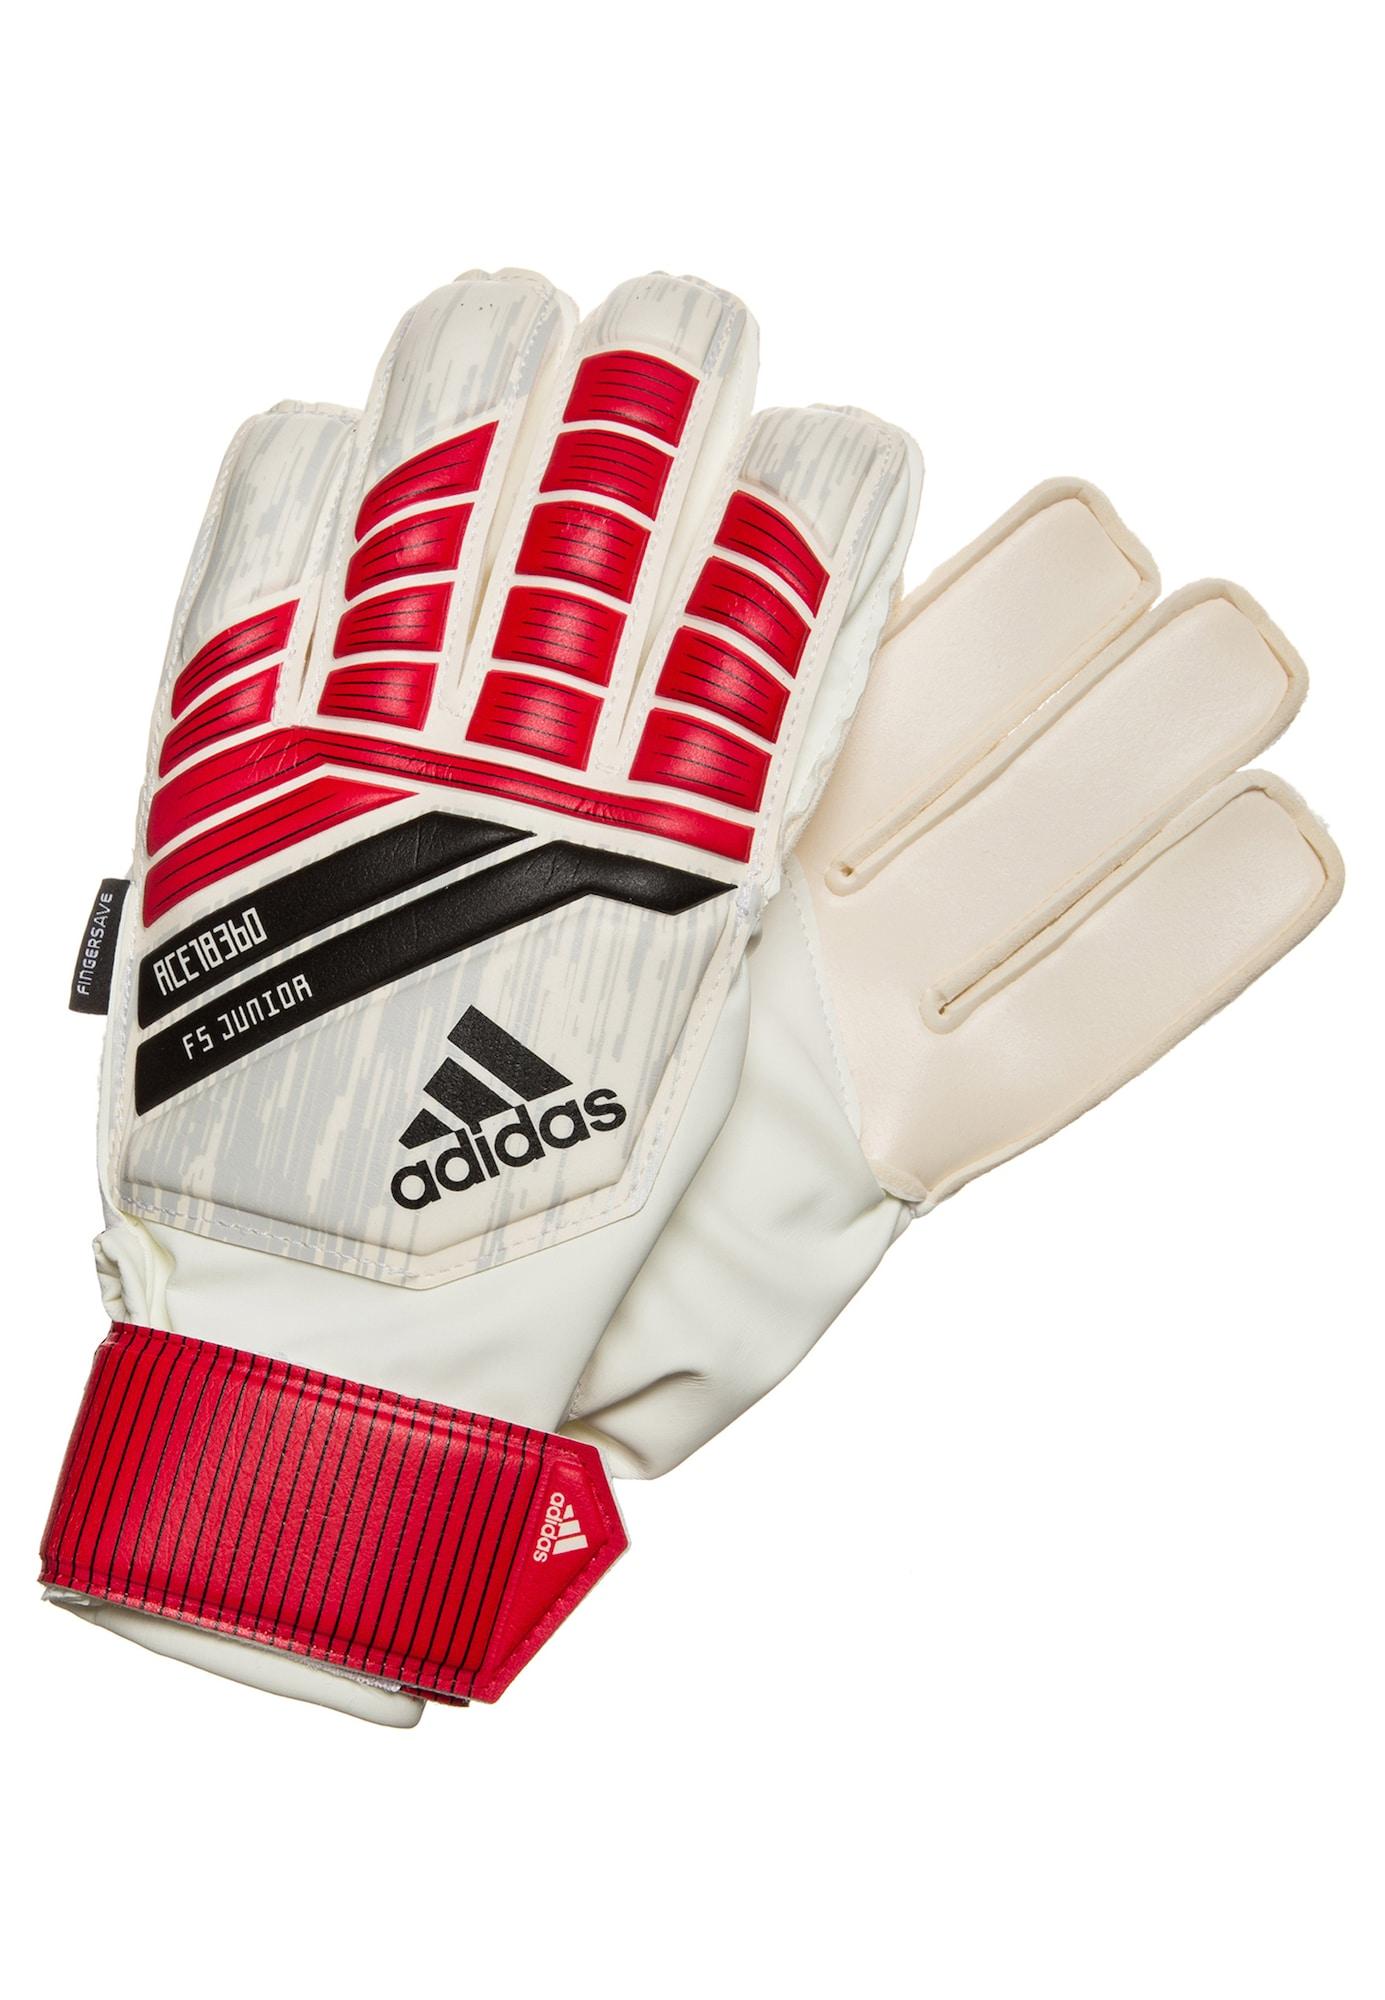 ADIDAS PERFORMANCE, Meisjes Sporthandschoenen 'Predator Fingersave', rood / wit